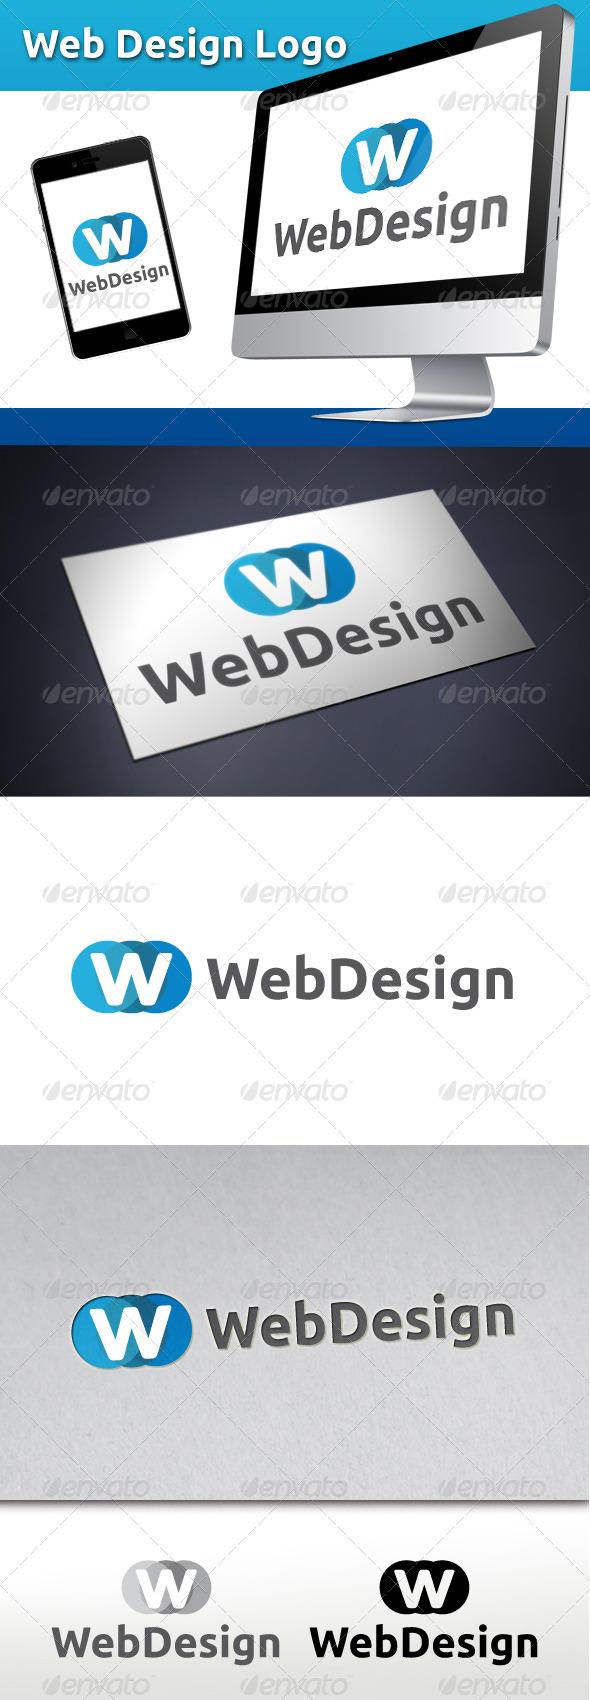 Web Design Logo 1